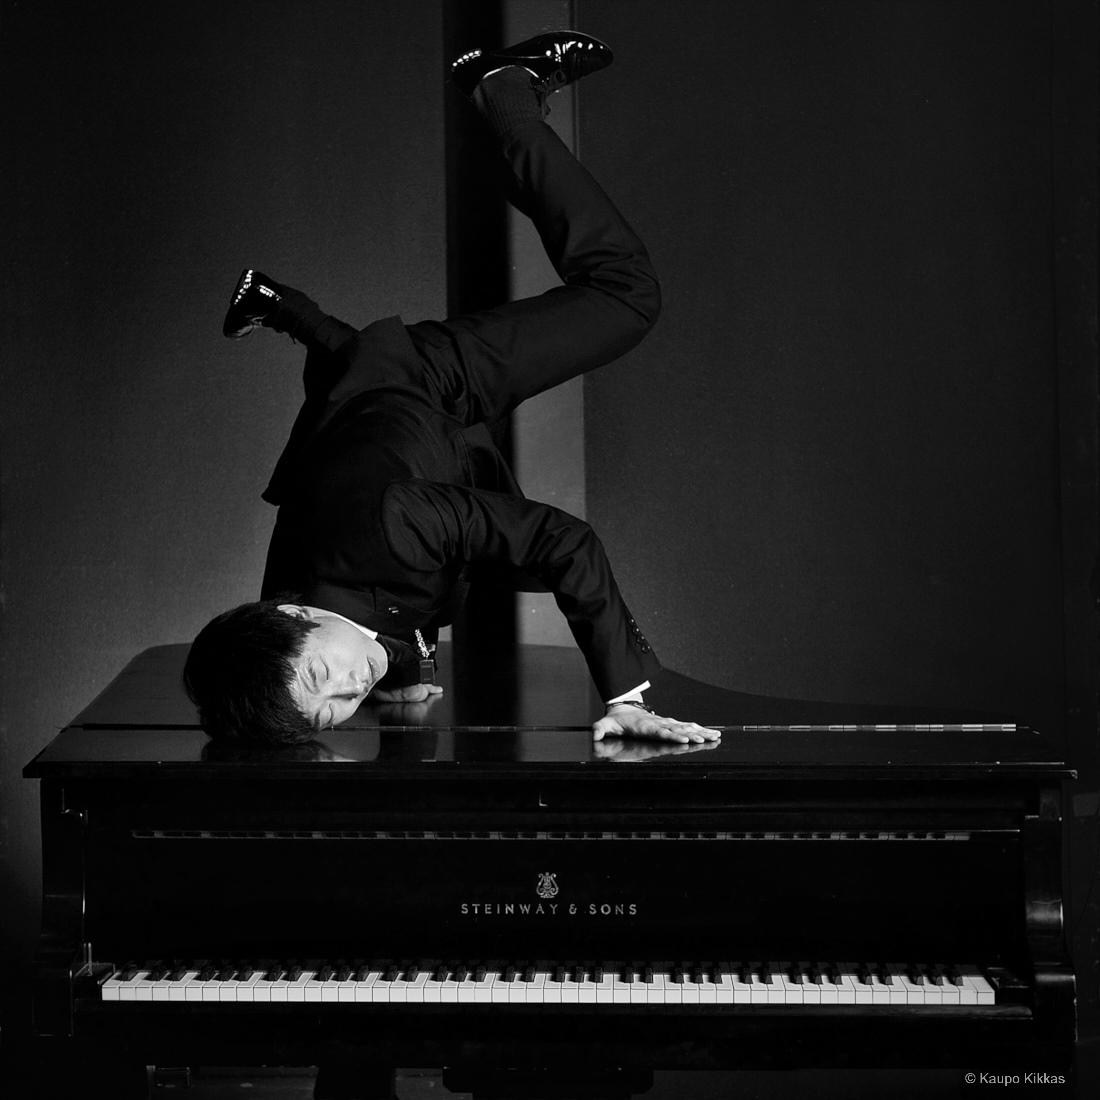 Pianist Ji Liu